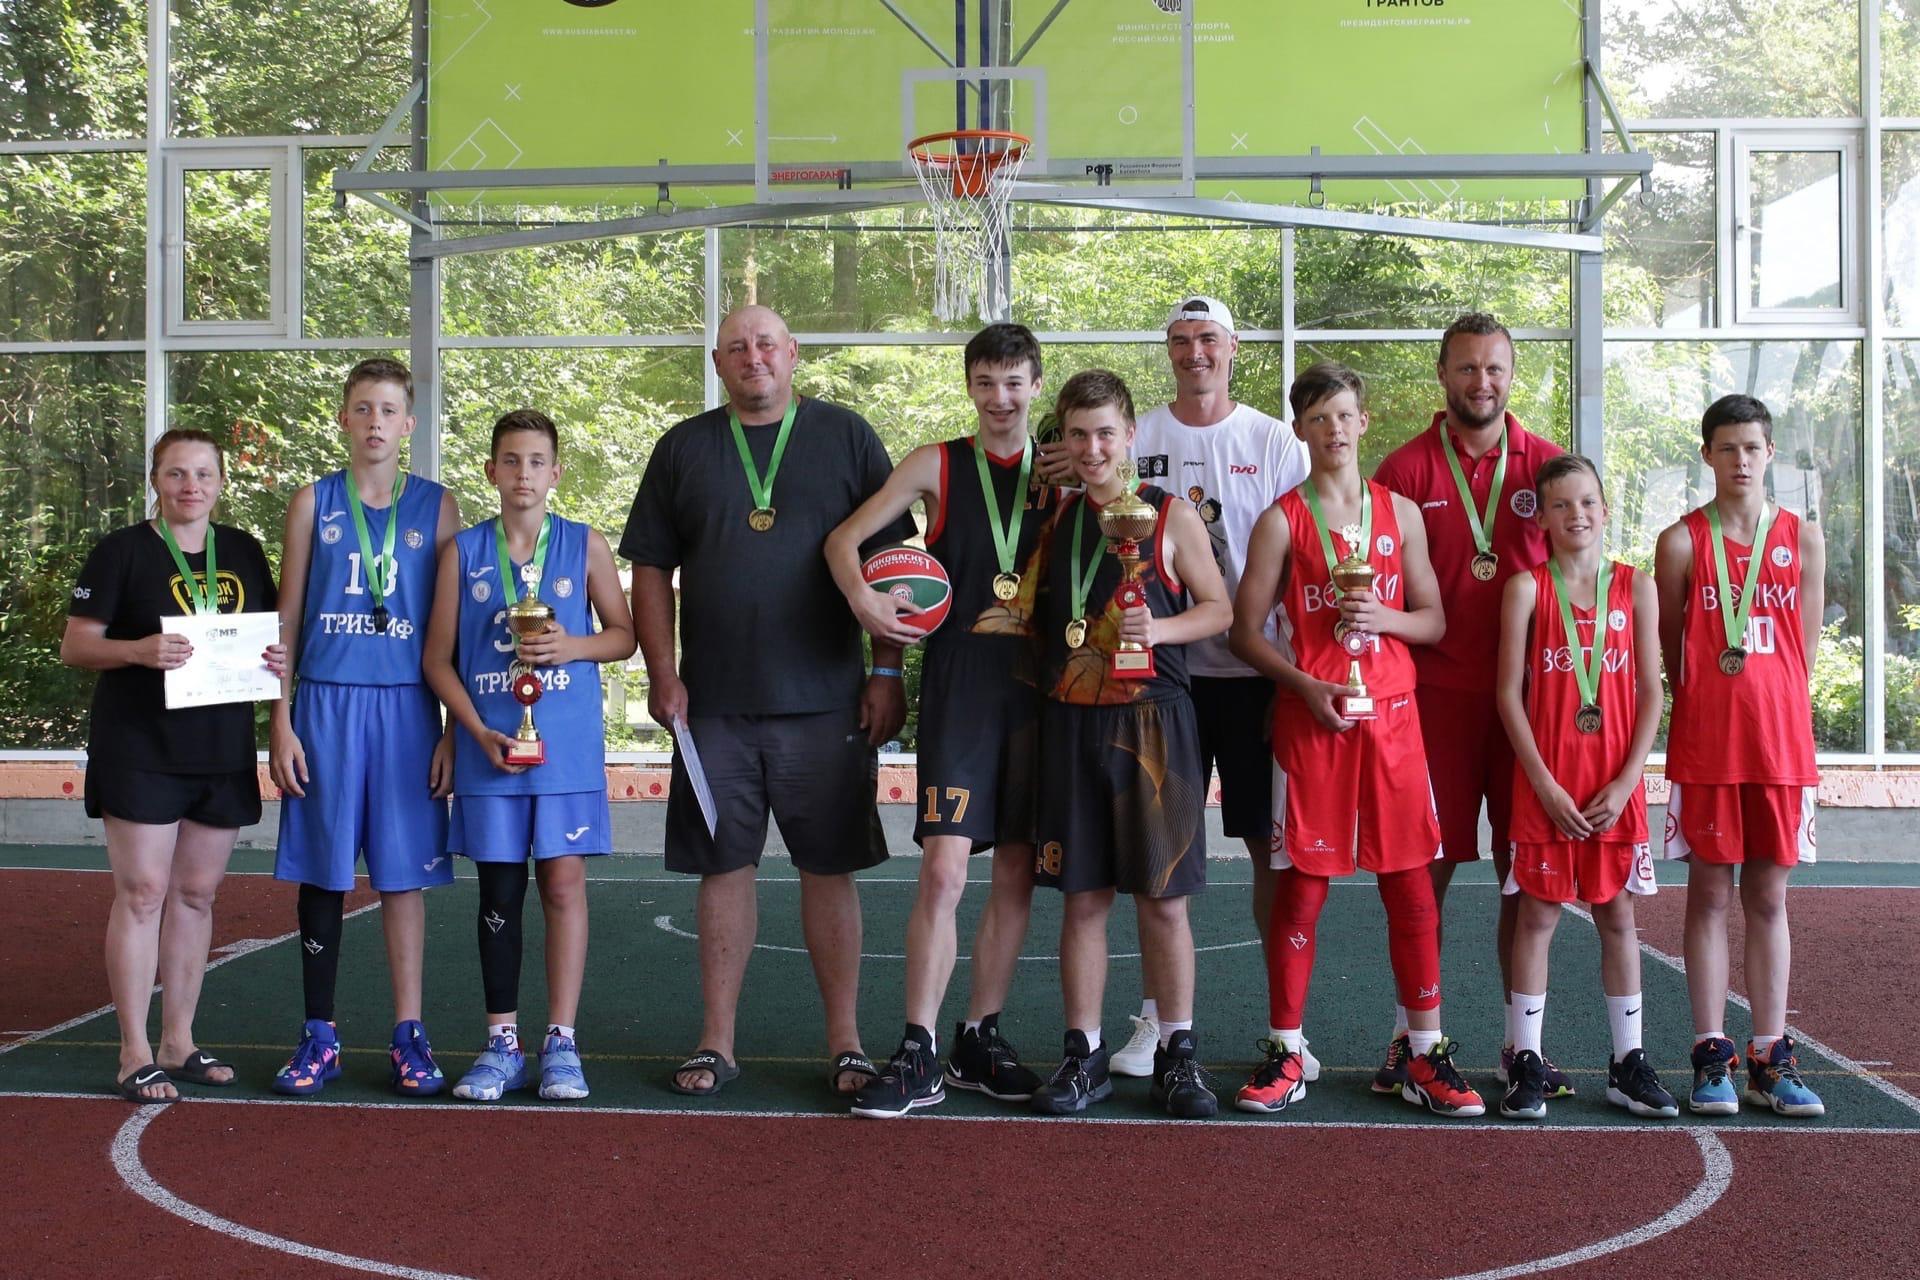 Призеры стритбола 2 х 2, Минибаскет 2008 г.р., г. Сукко